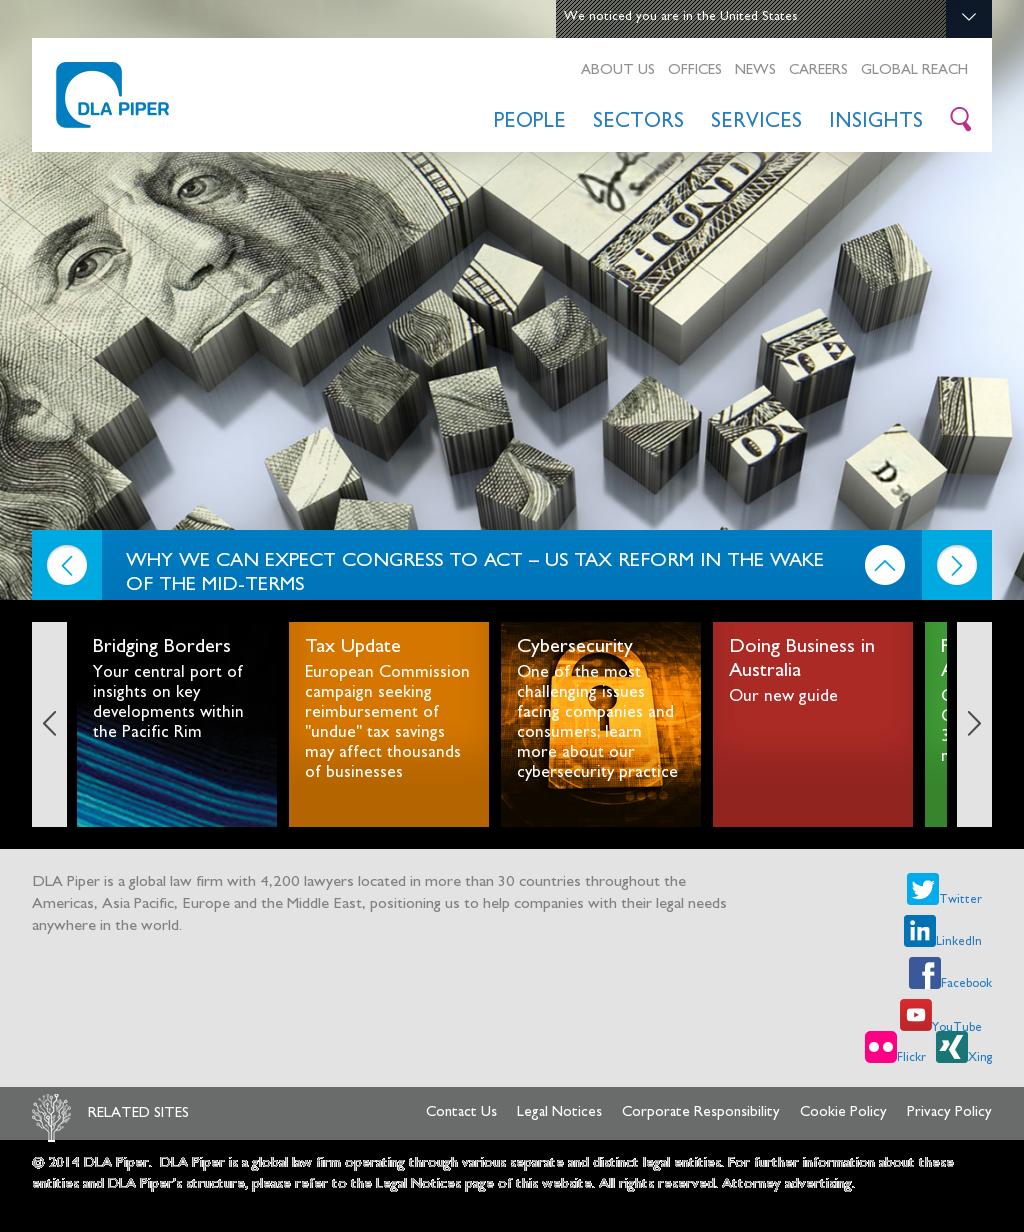 DLA Piper Competitors, Revenue and Employees - Owler Company Profile